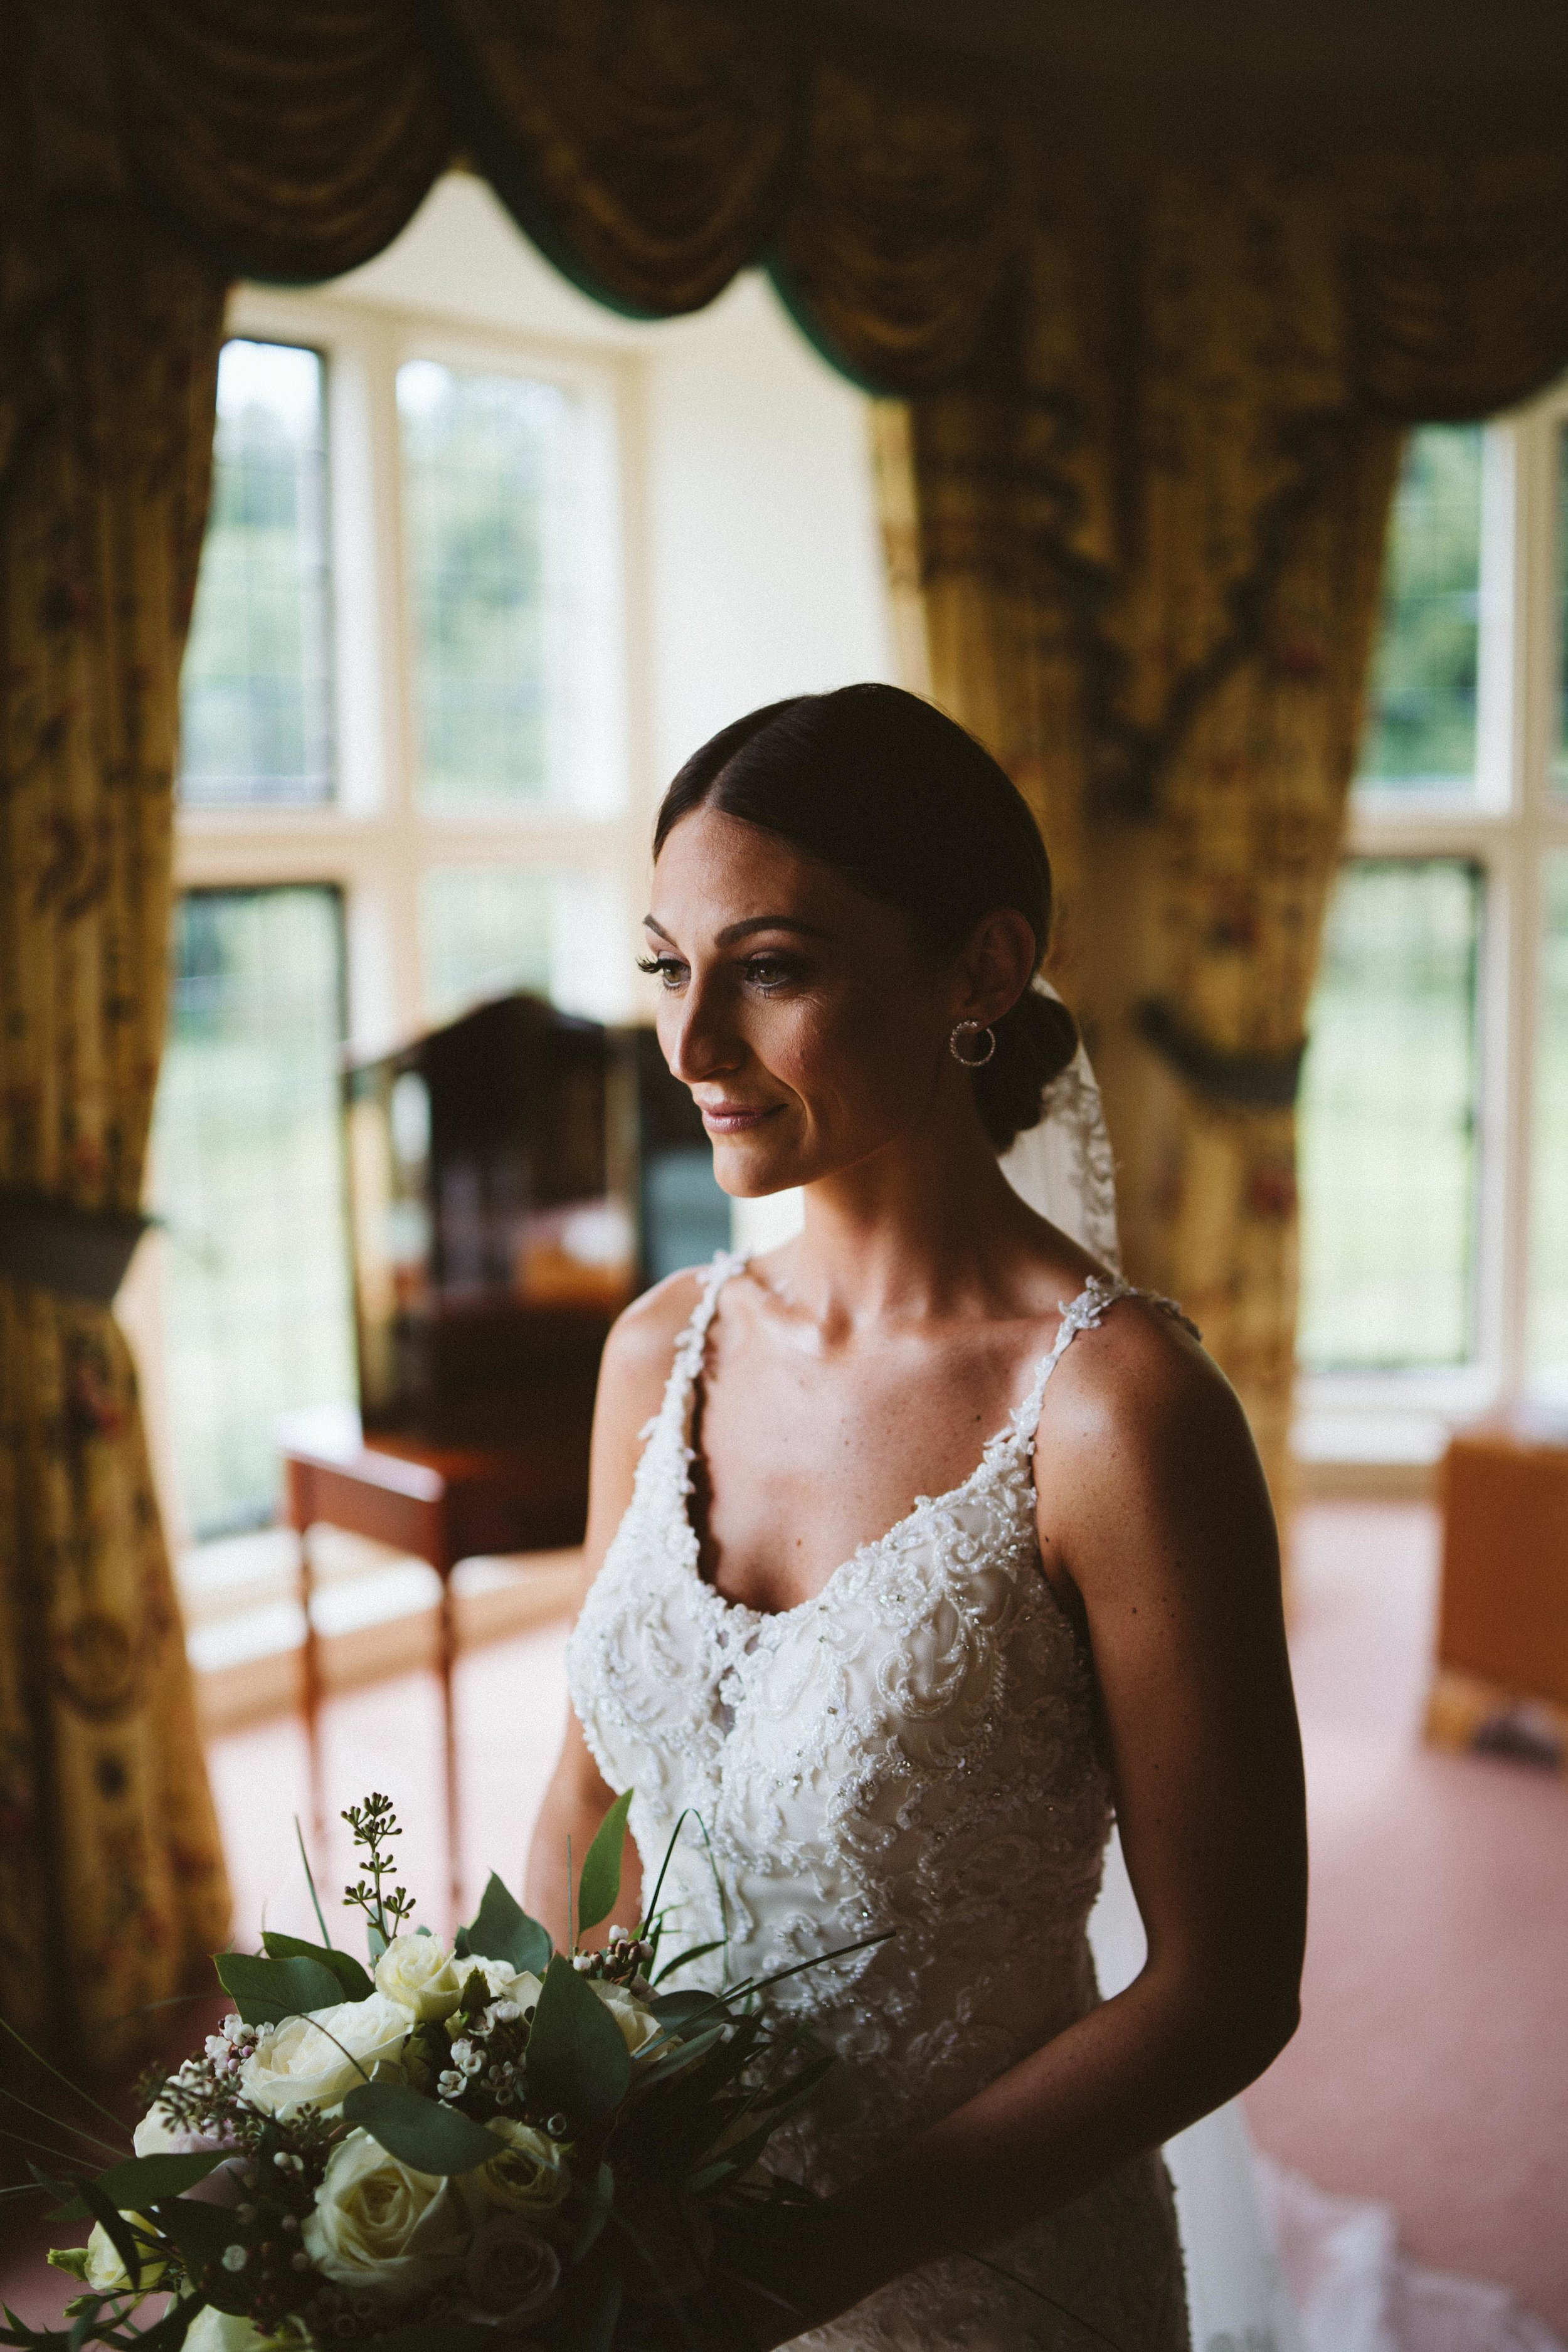 kent-wedding-photographer-104183.jpg